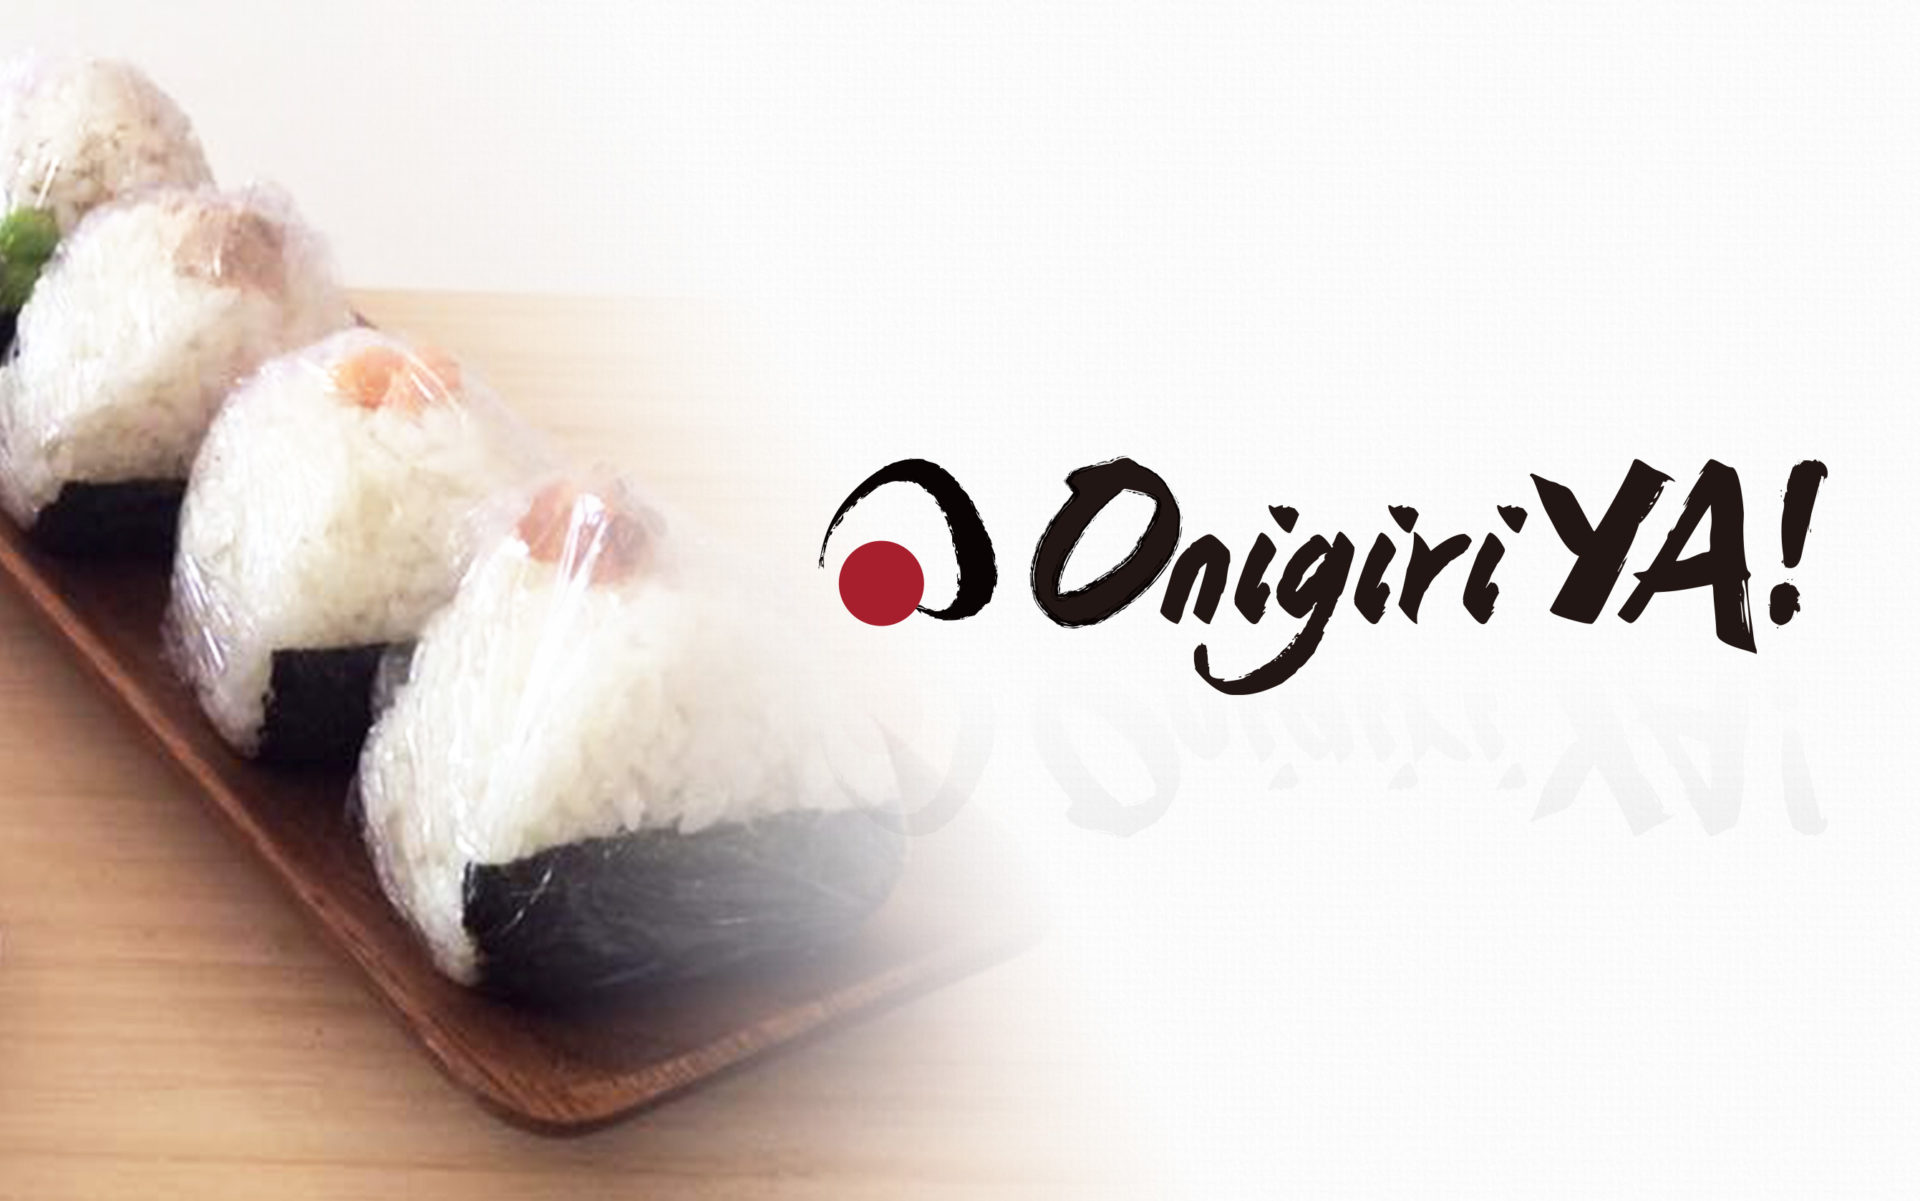 Onigiri YA!